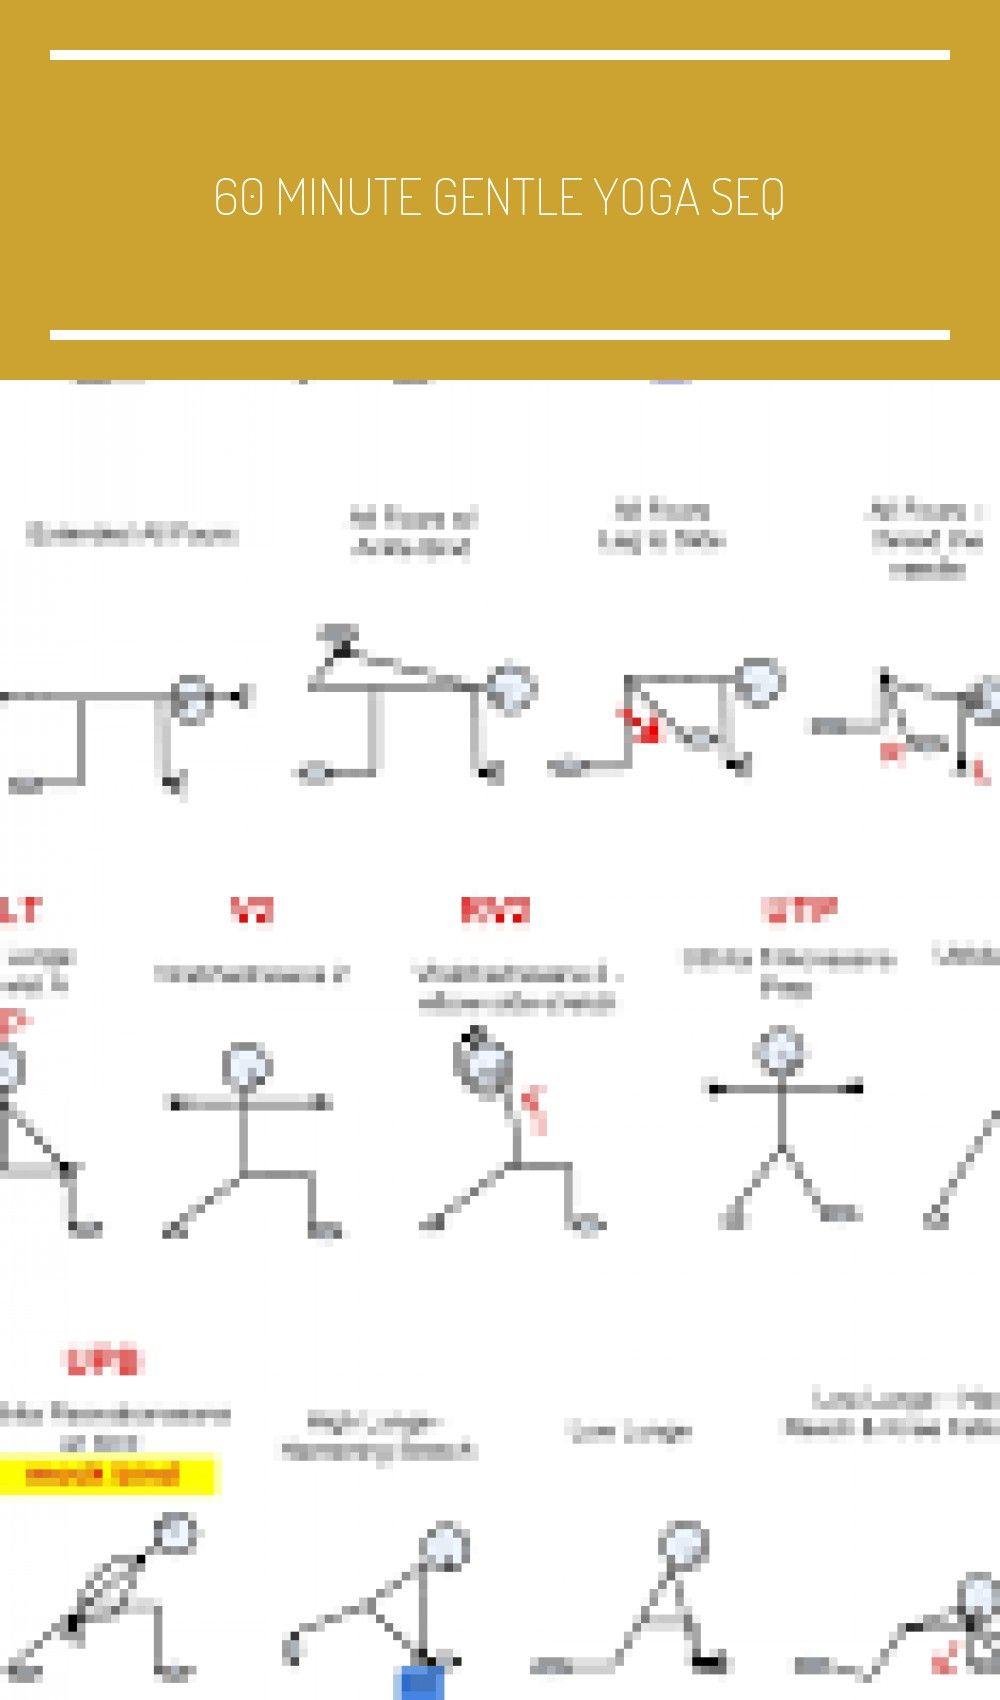 Gentle Yoga Sequence Pdf